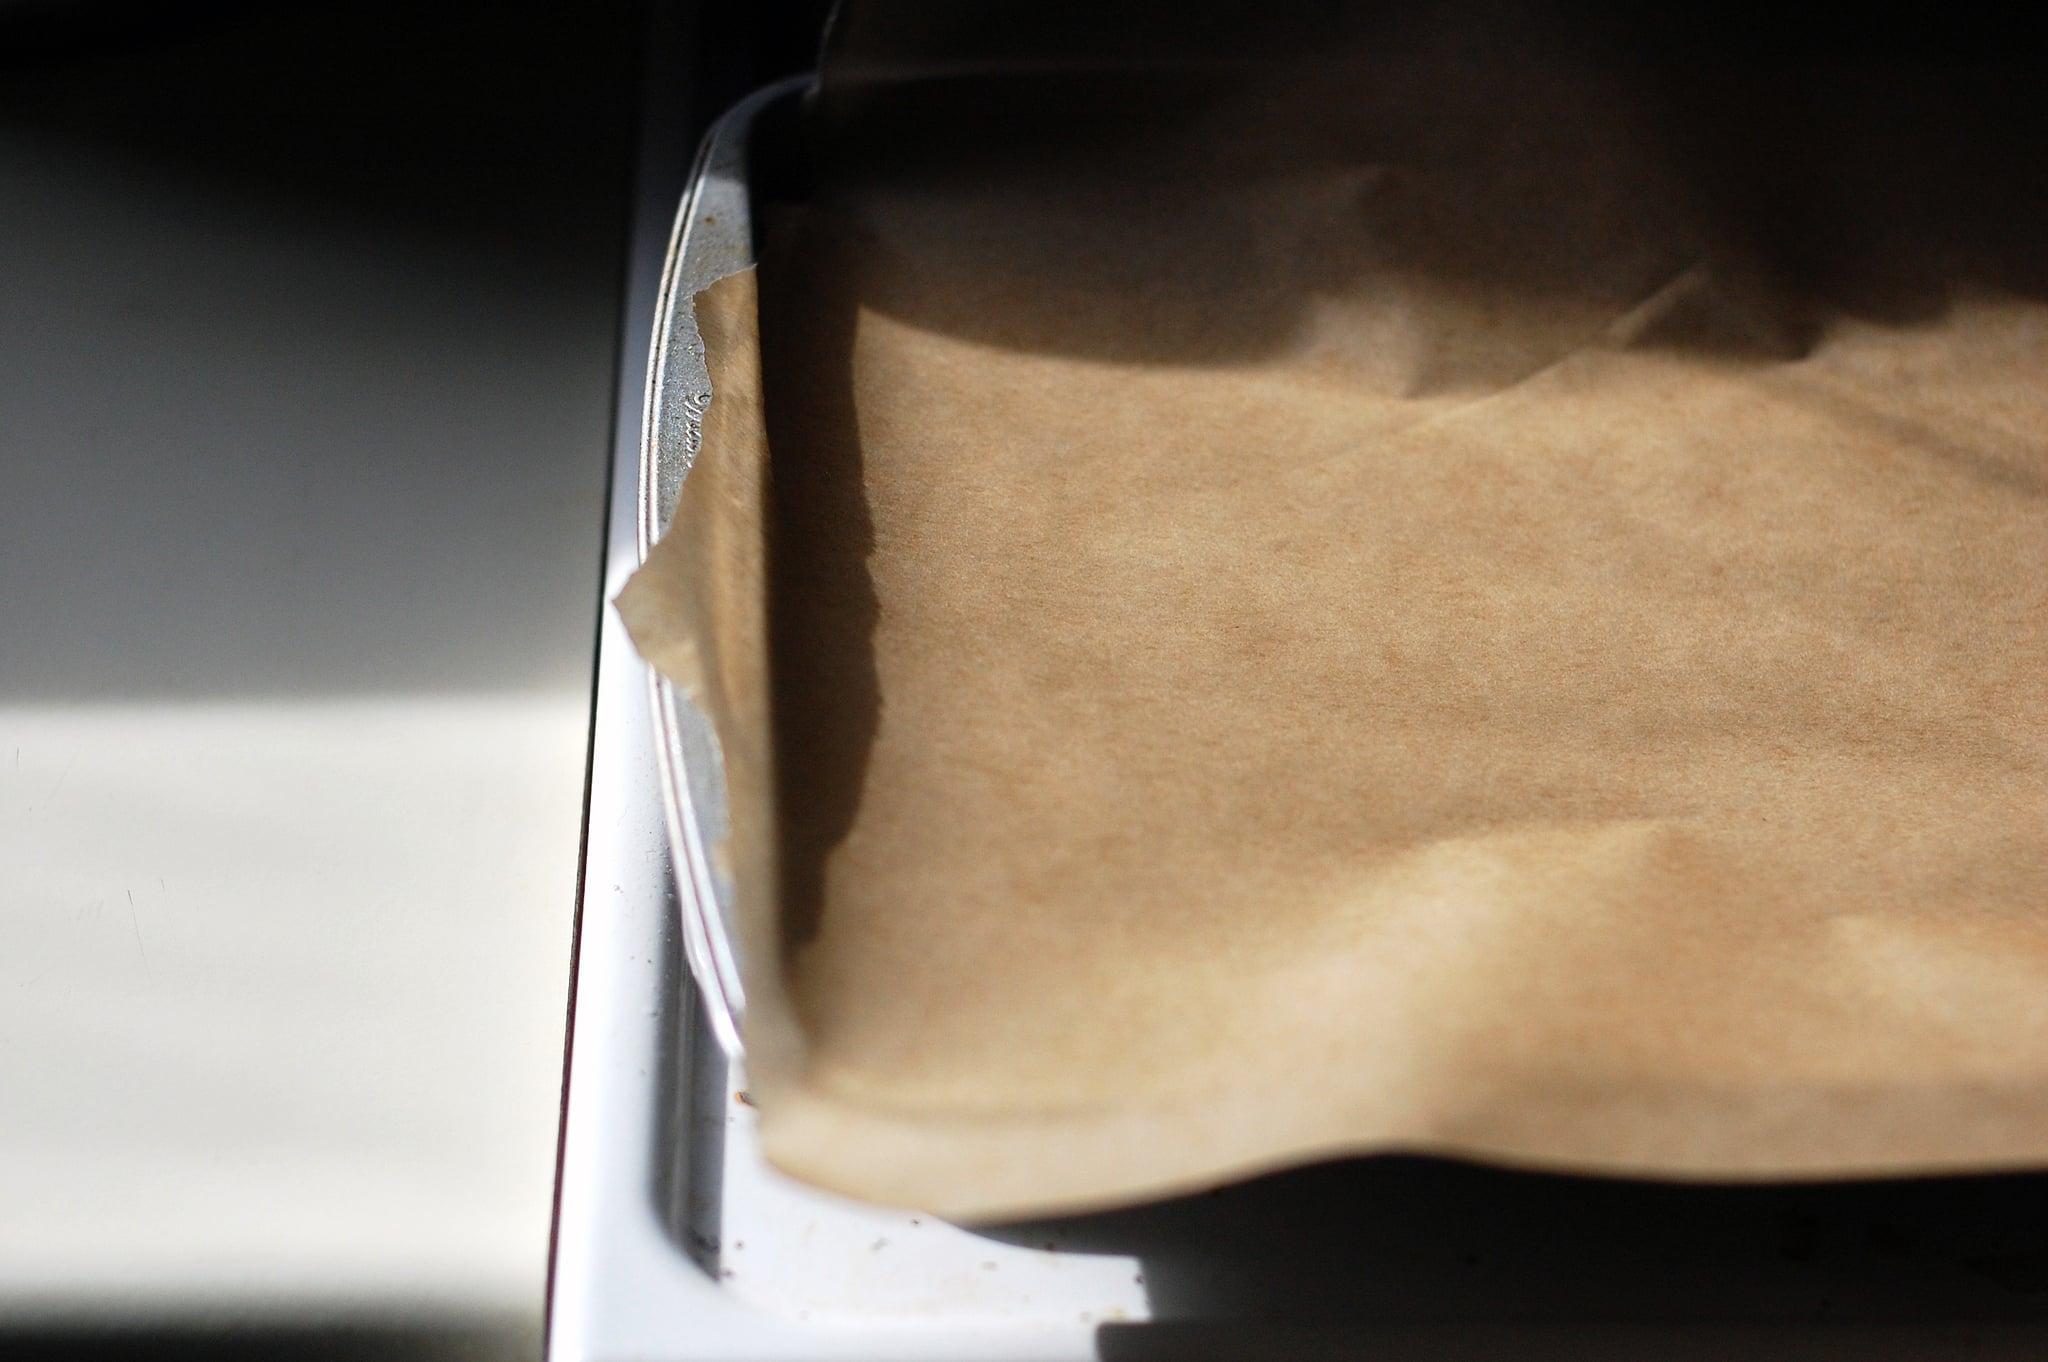 Prep the Baking Sheet